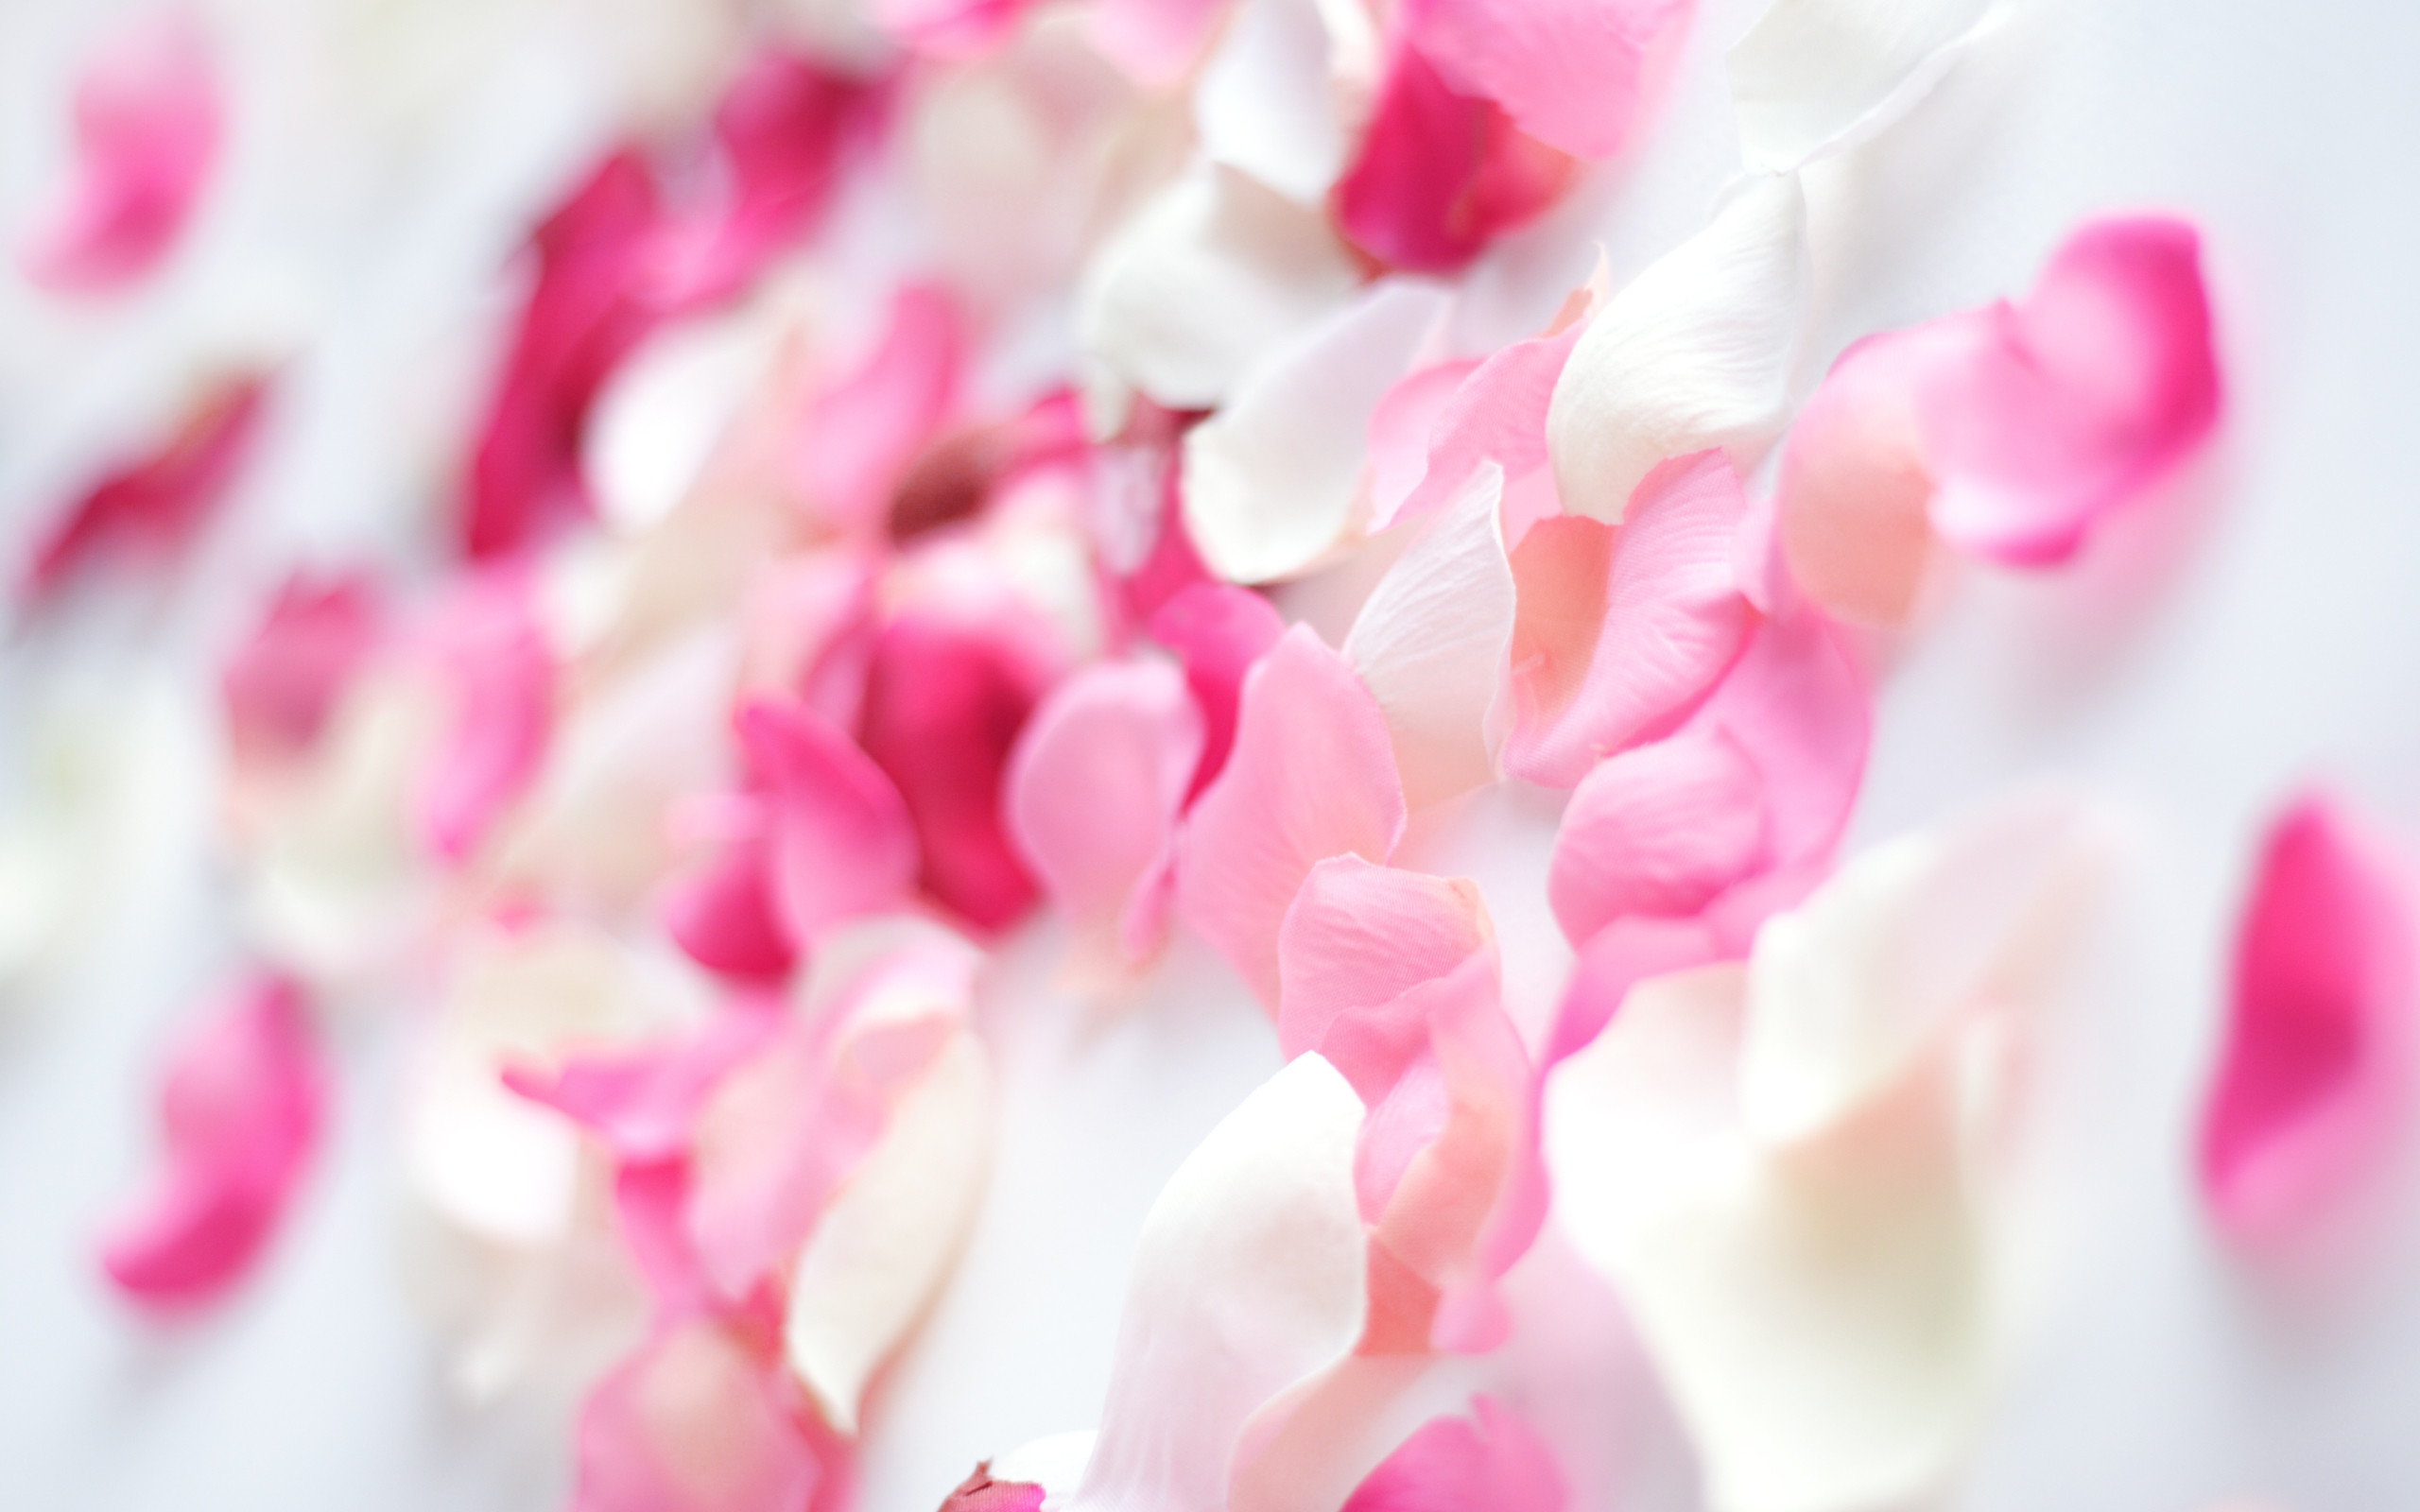 Pink Flower Wallpapers Mobile - Fond D Écran Beauté Soins , HD Wallpaper & Backgrounds